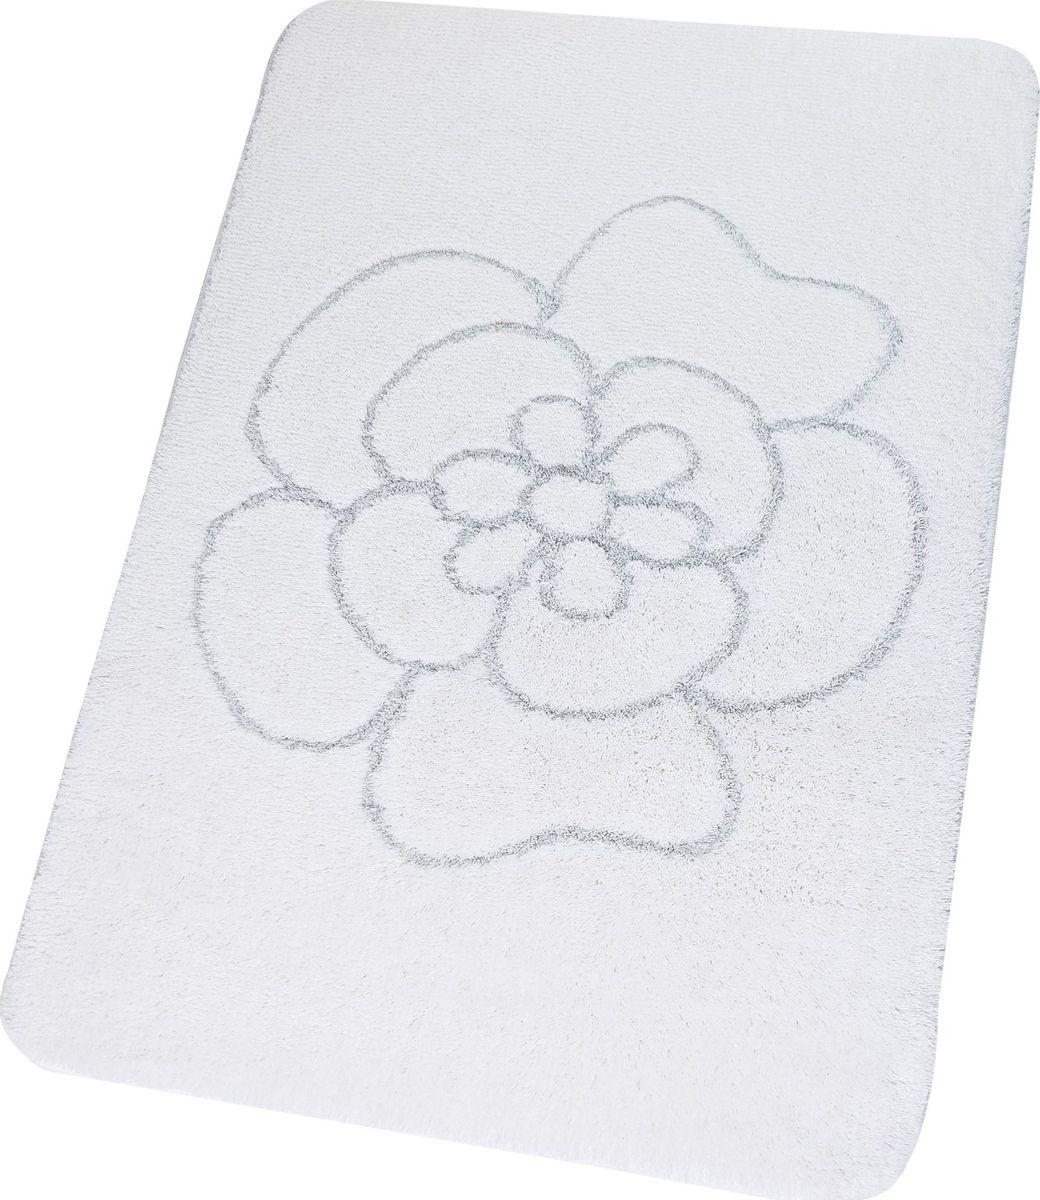 Коврик для ванной Ridder  Diamond , цвет: белый, 70 х 120 см - Коврики